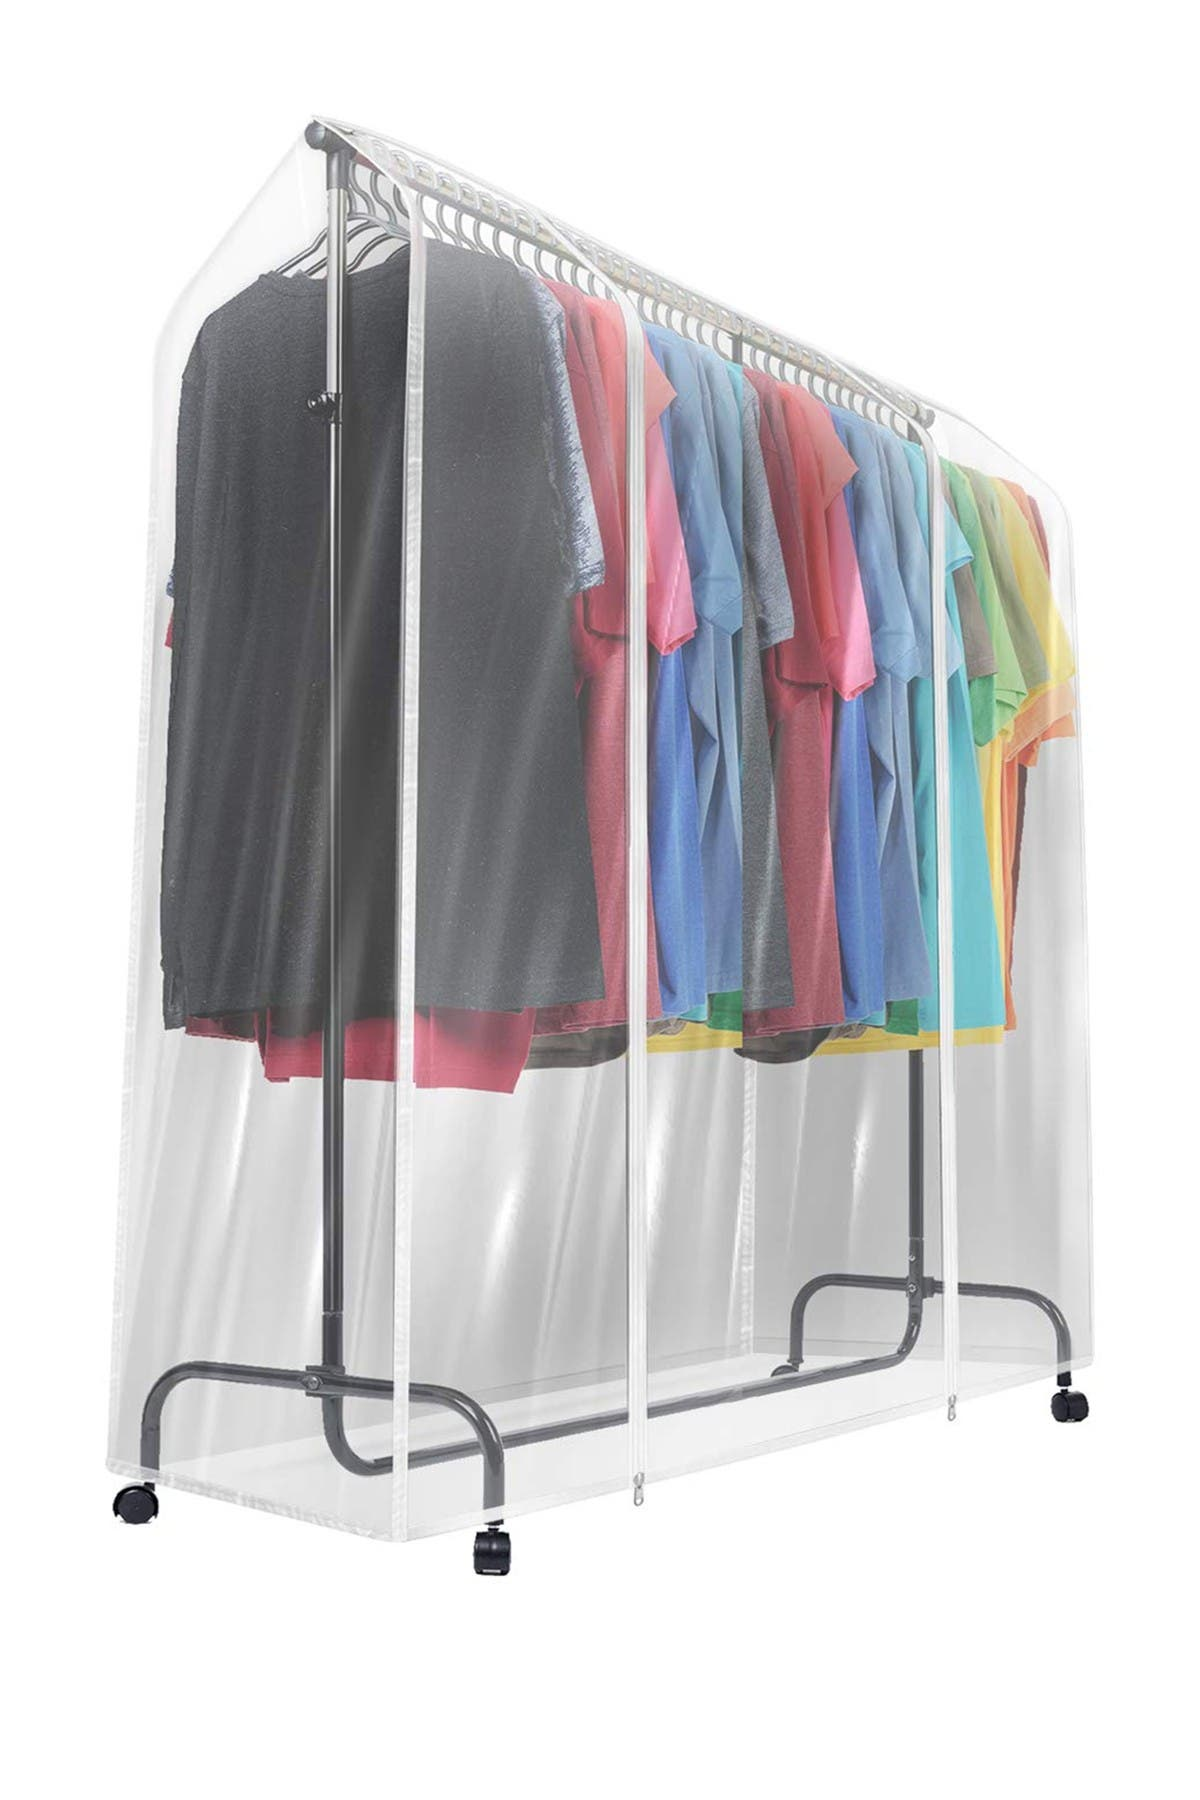 Image of Sorbus Transparent Garment Rack Cover